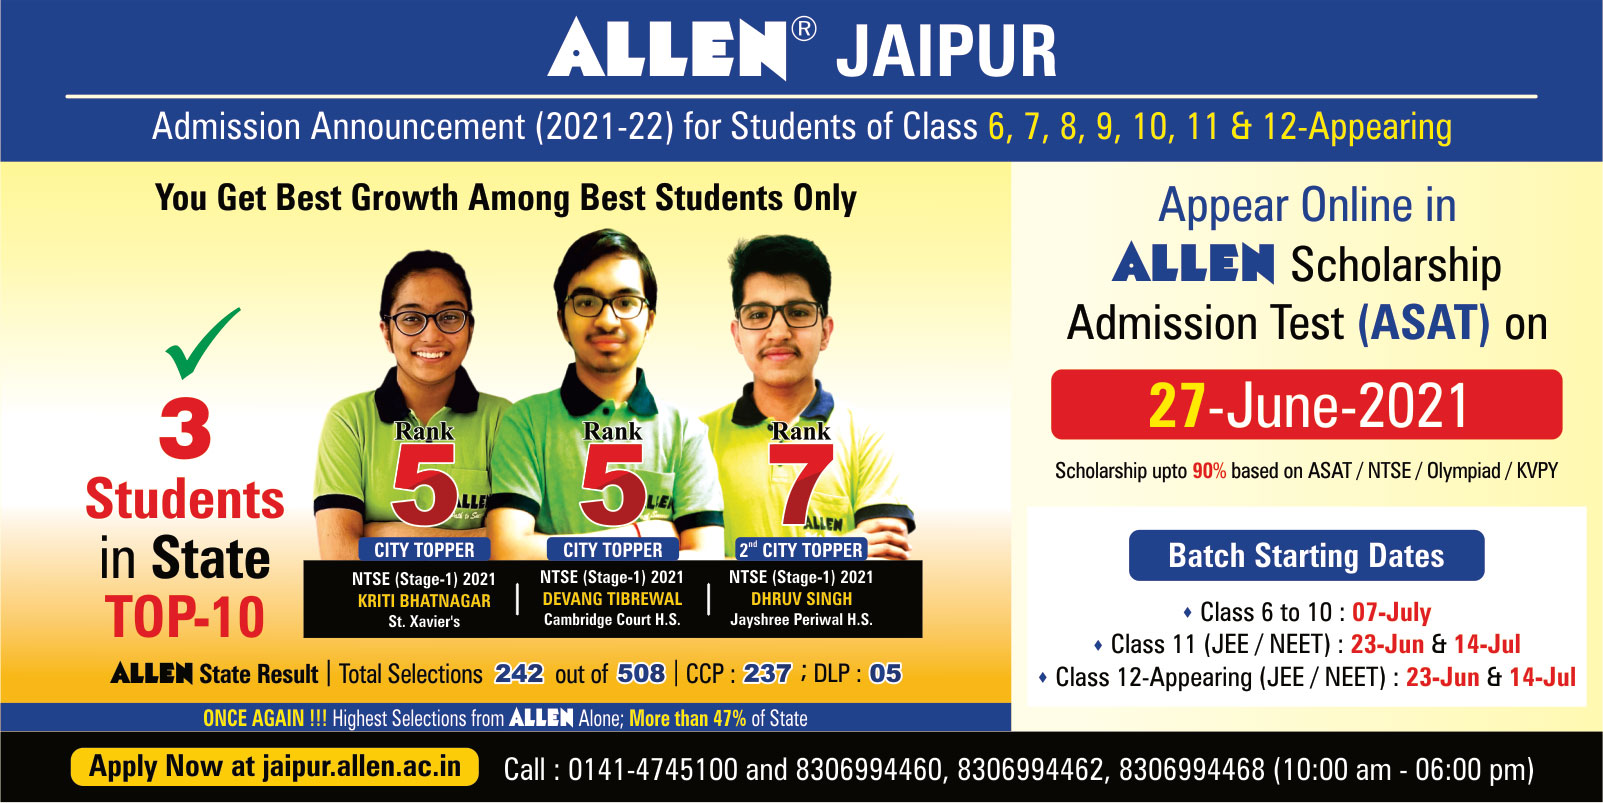 ALLEN Digital Course Starting Date_21June_1017